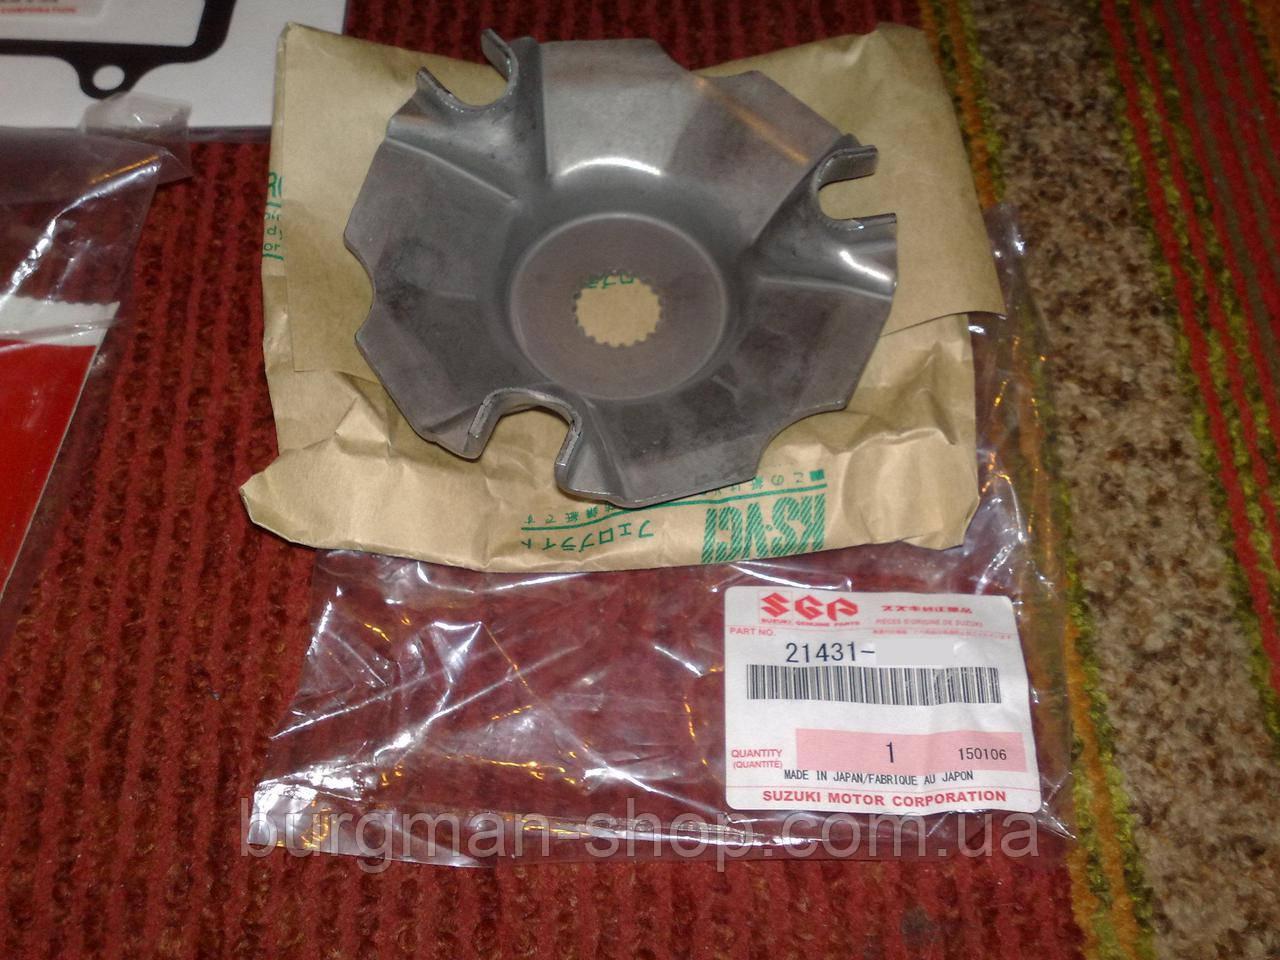 Мет. плата вариатора 250K7 Suzuki Burgman SkyWave 21431-06H00